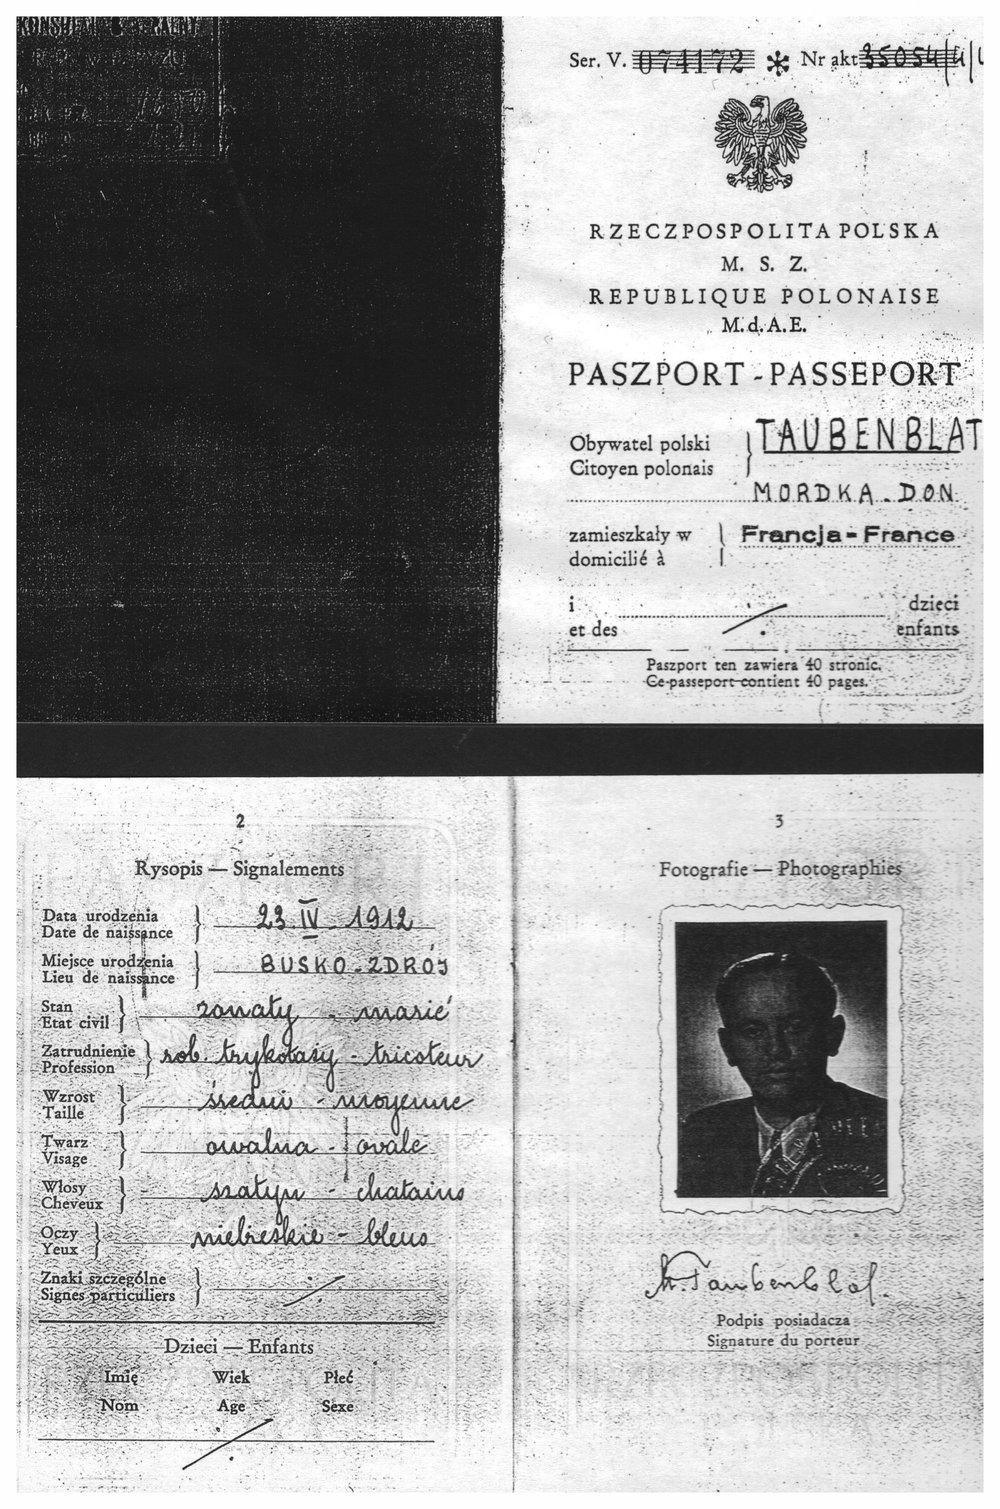 My father's Polish passport - Mordka Taubenblat